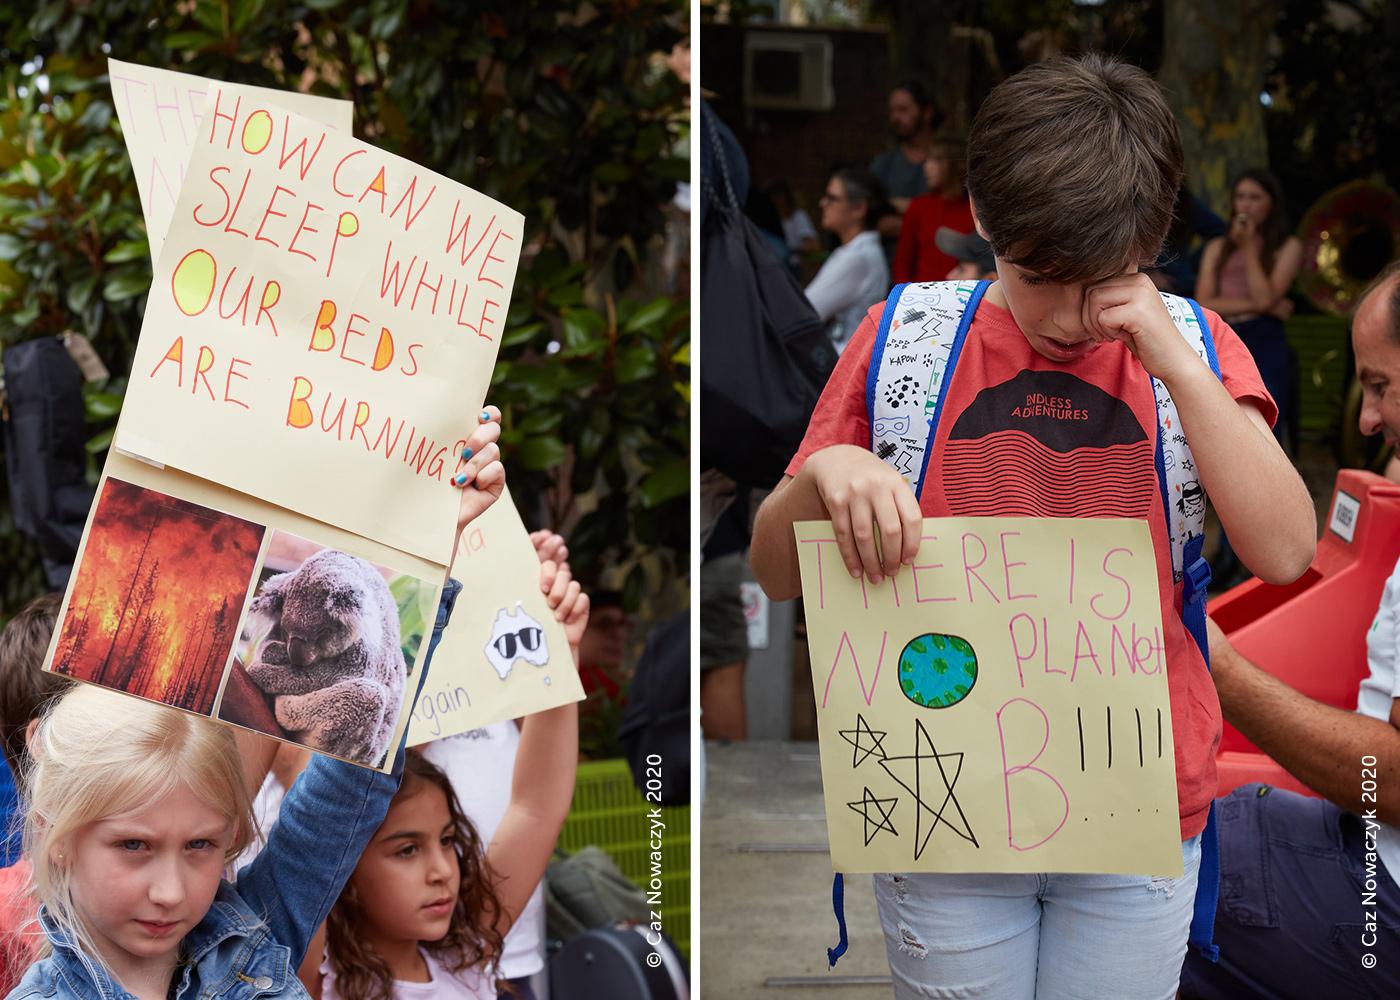 Climate-Change-Rally-Wollongong-January-2020-by-Caz-Nowaczyk-02